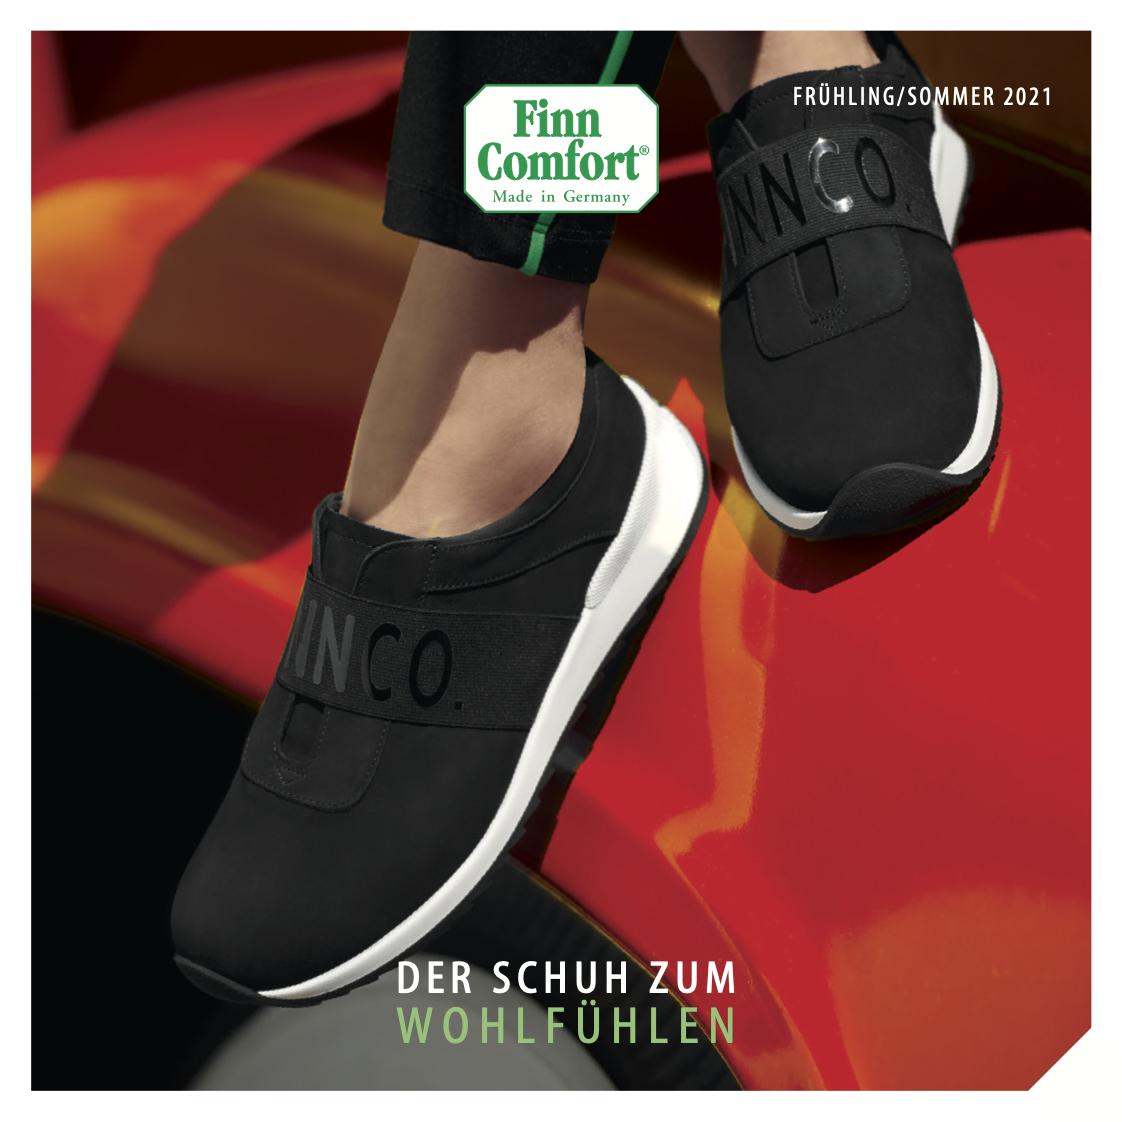 Dresjan-Schier-FinnComfort_Prospekt_HW20_thumb